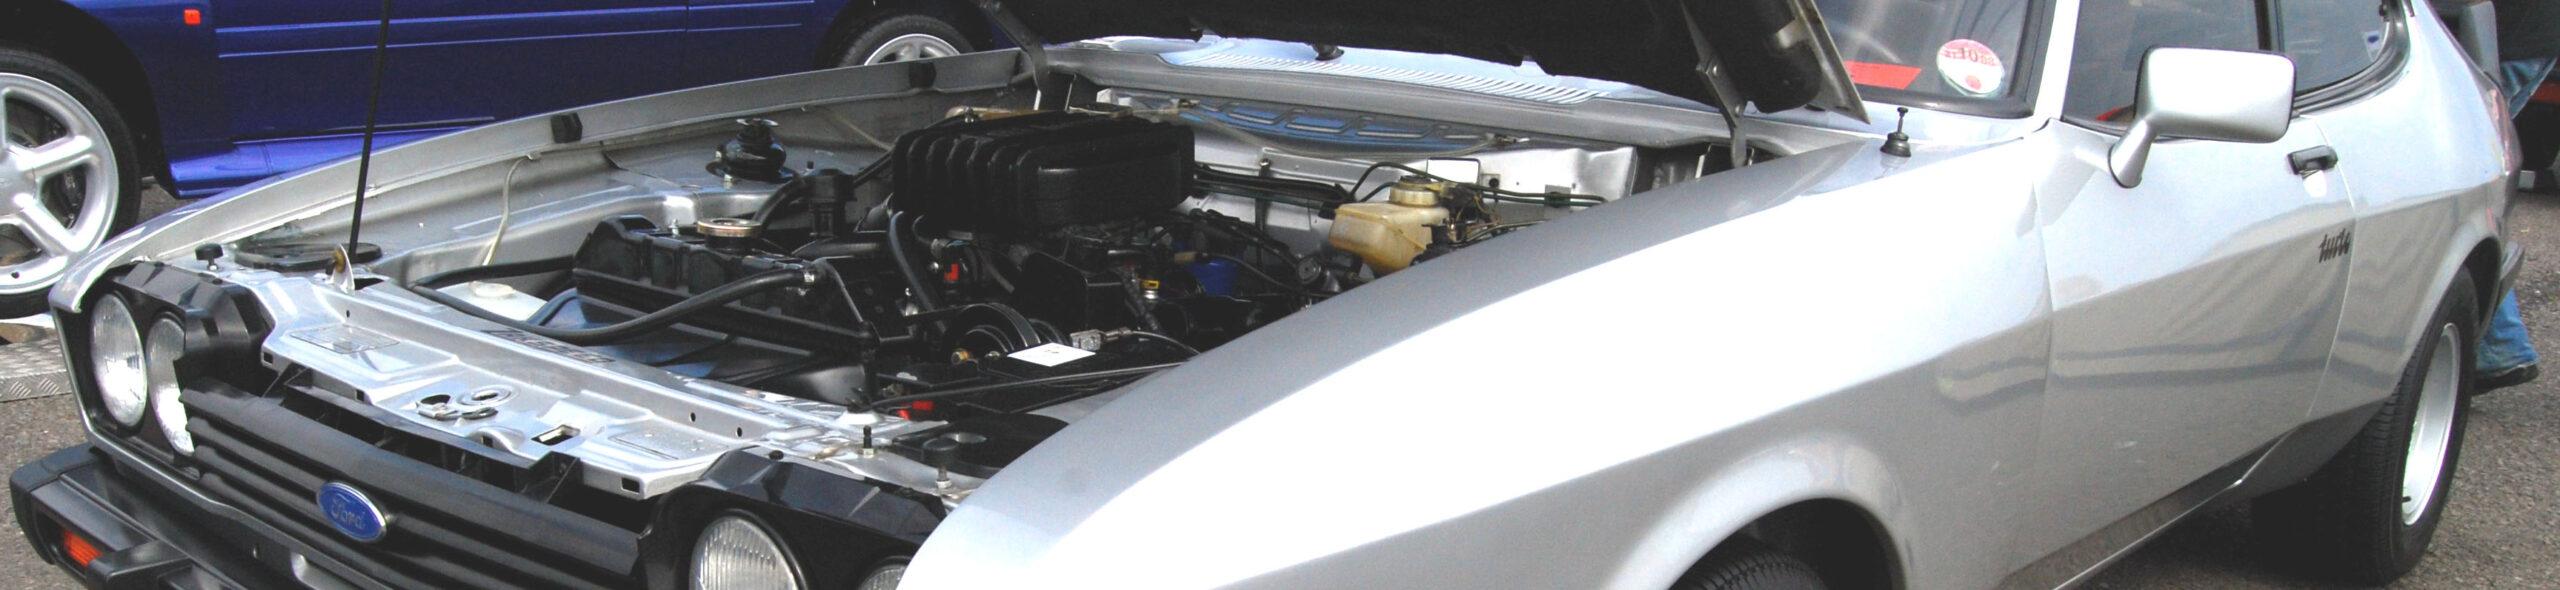 Capri RS2800